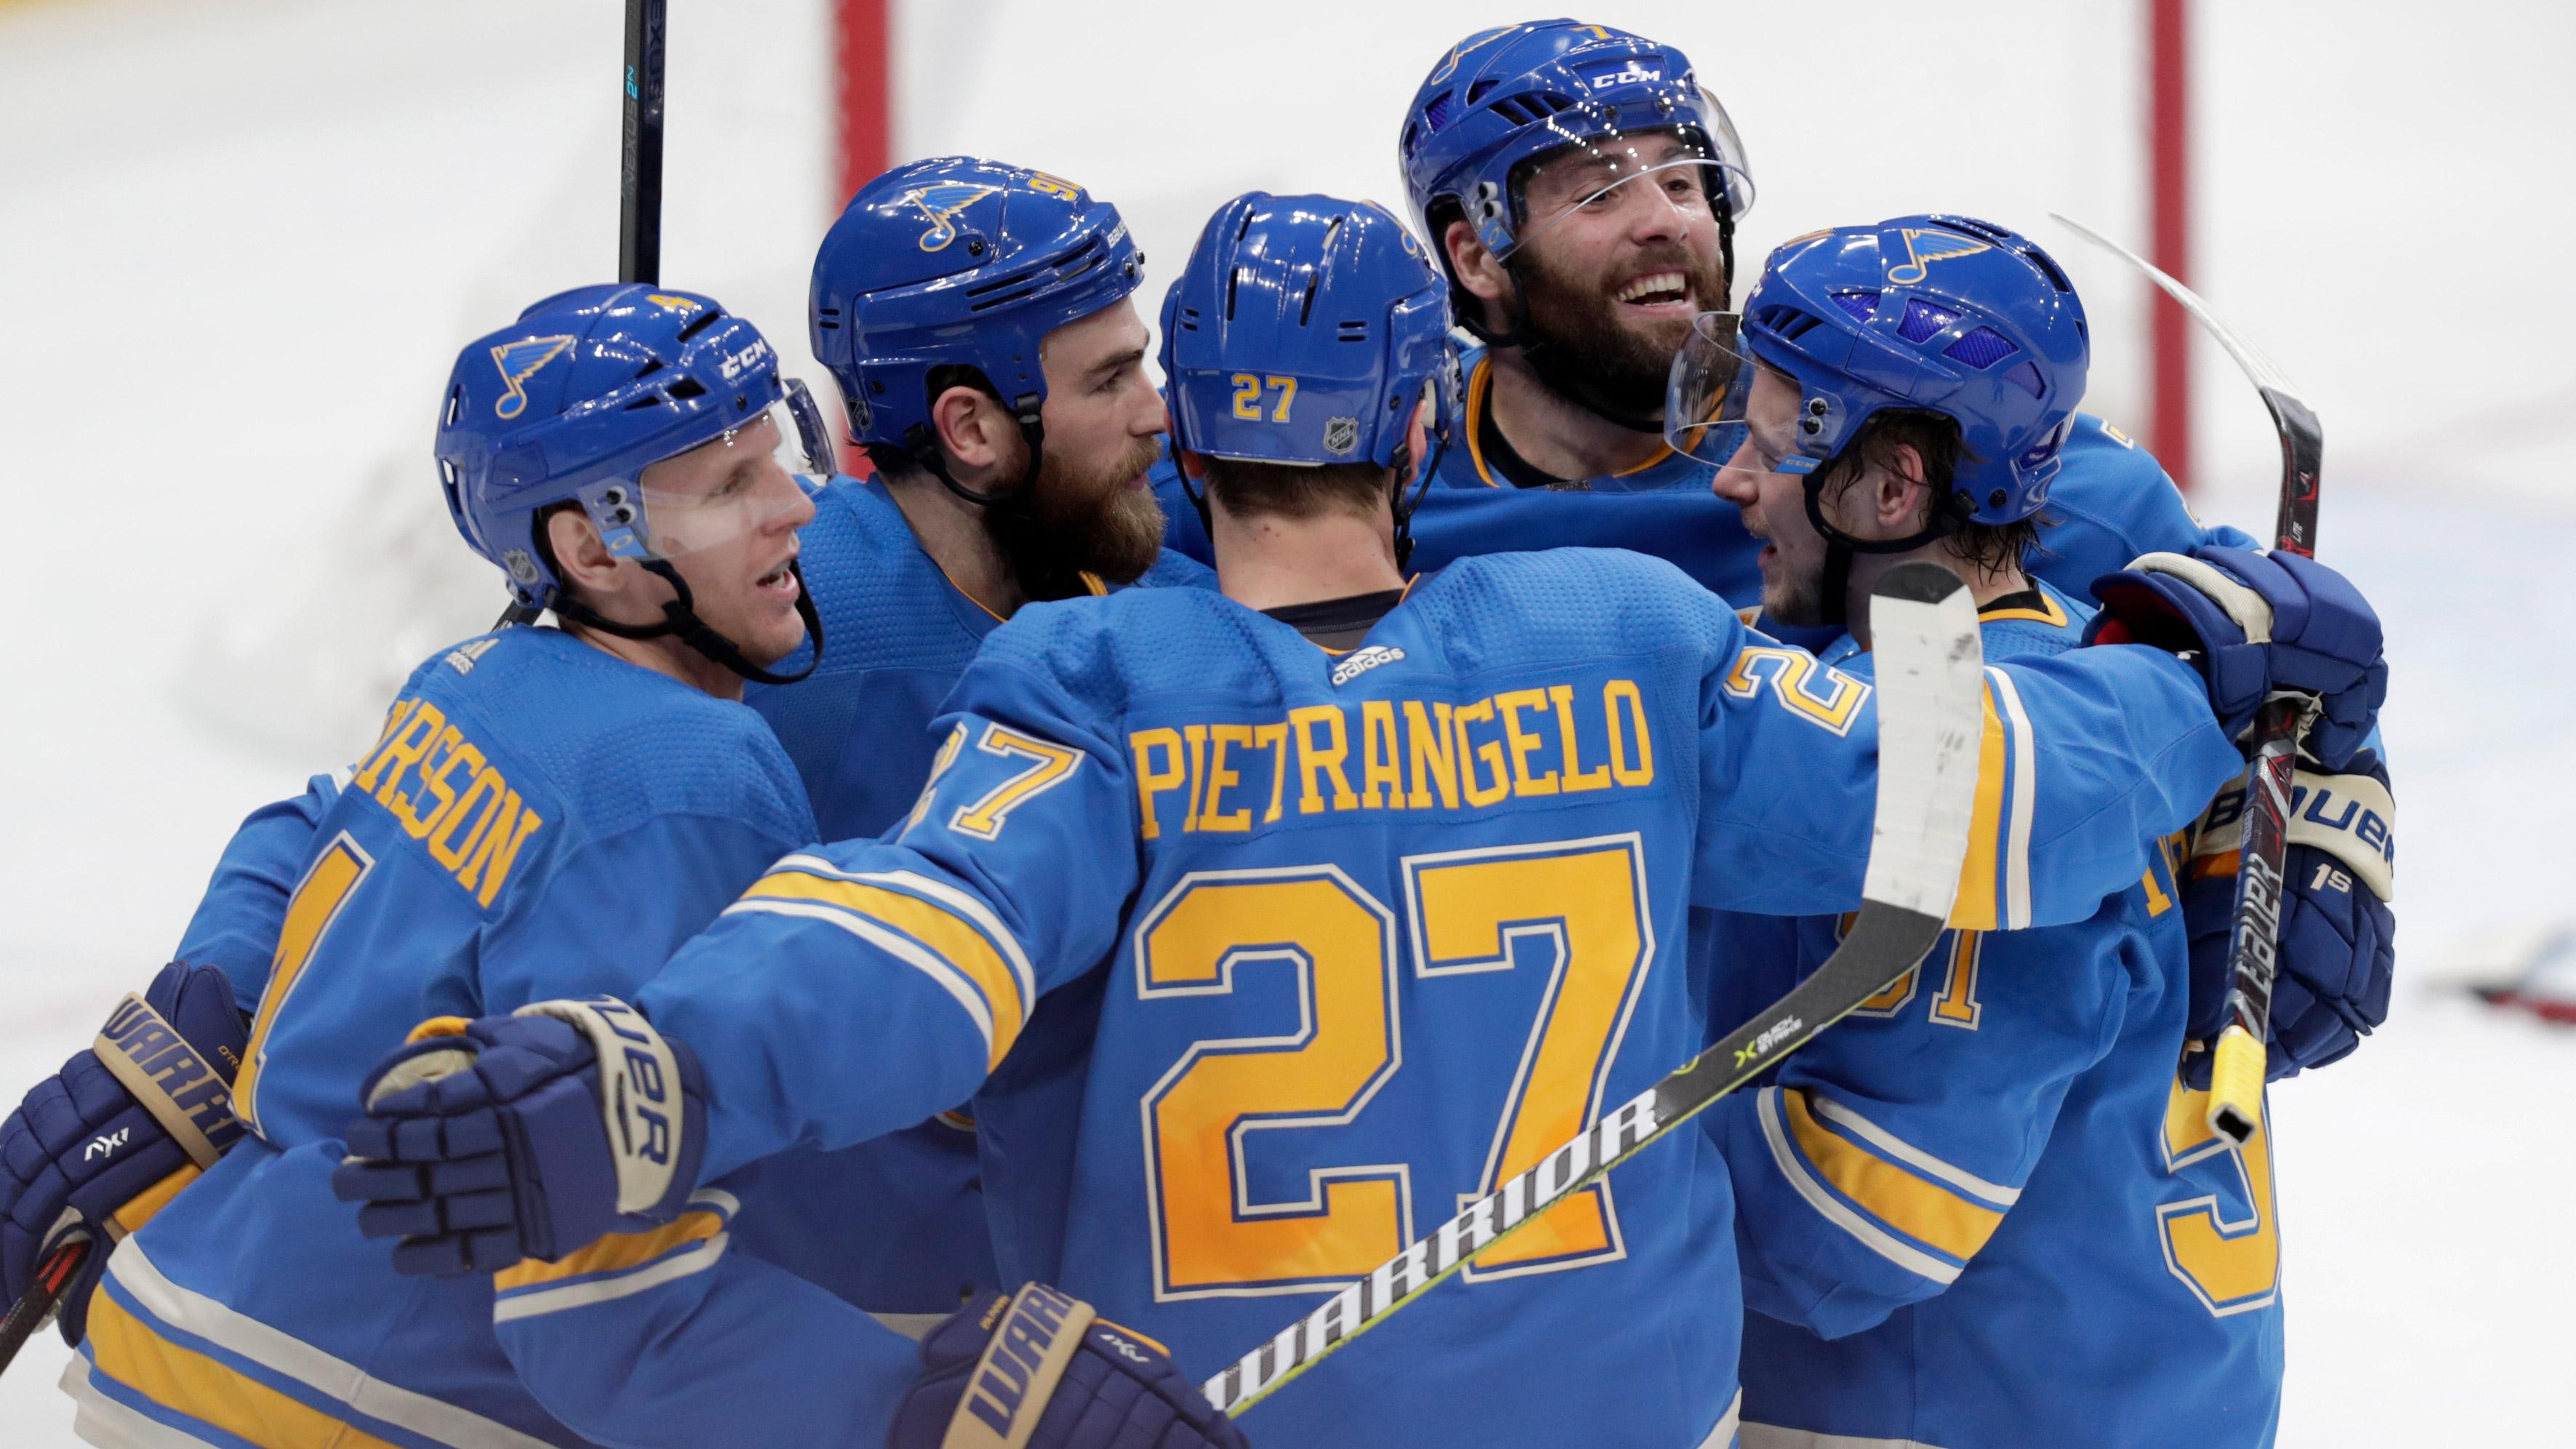 Gunnarsson's go-ahead goal leads Blues past Senators, 3-2